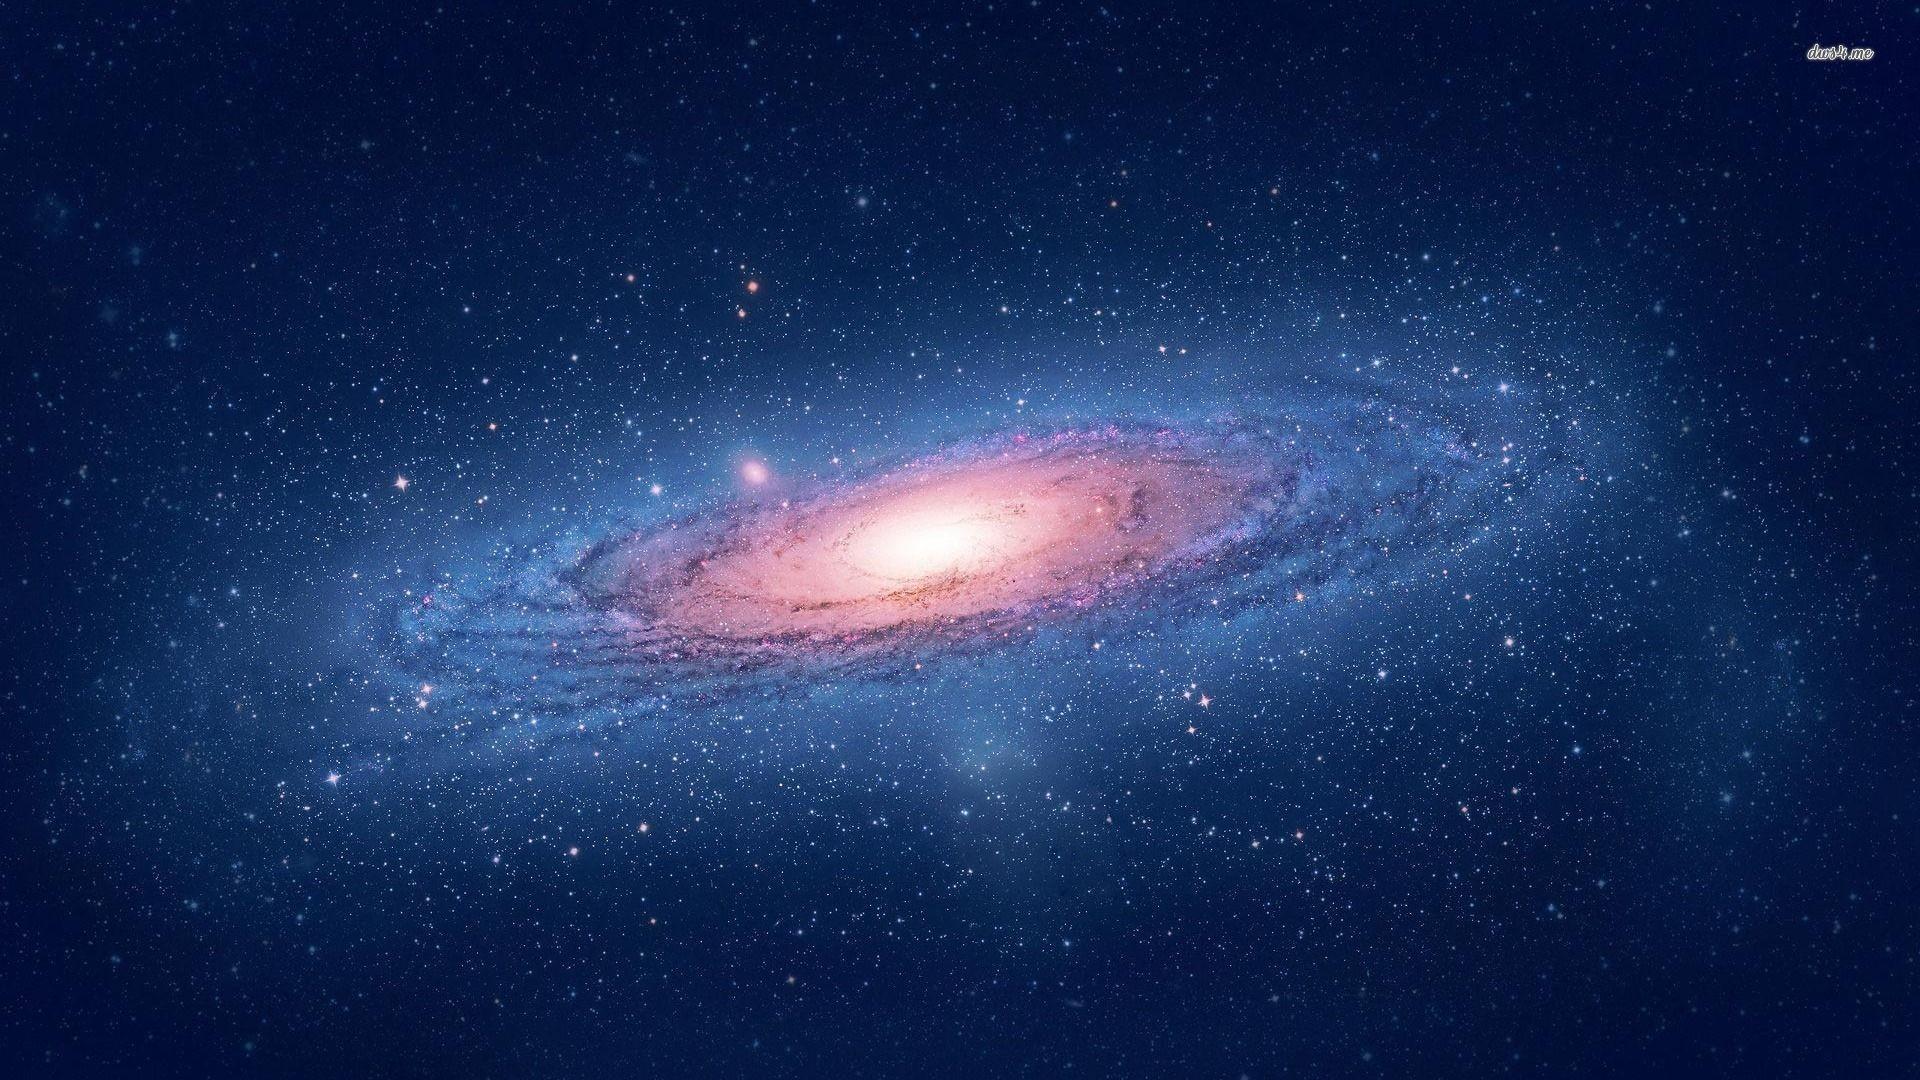 Andromeda galaxy 4k ultra hd wide wallpaper hd wallpapers – Andromeda Wallpapers  Wallpaper Cave